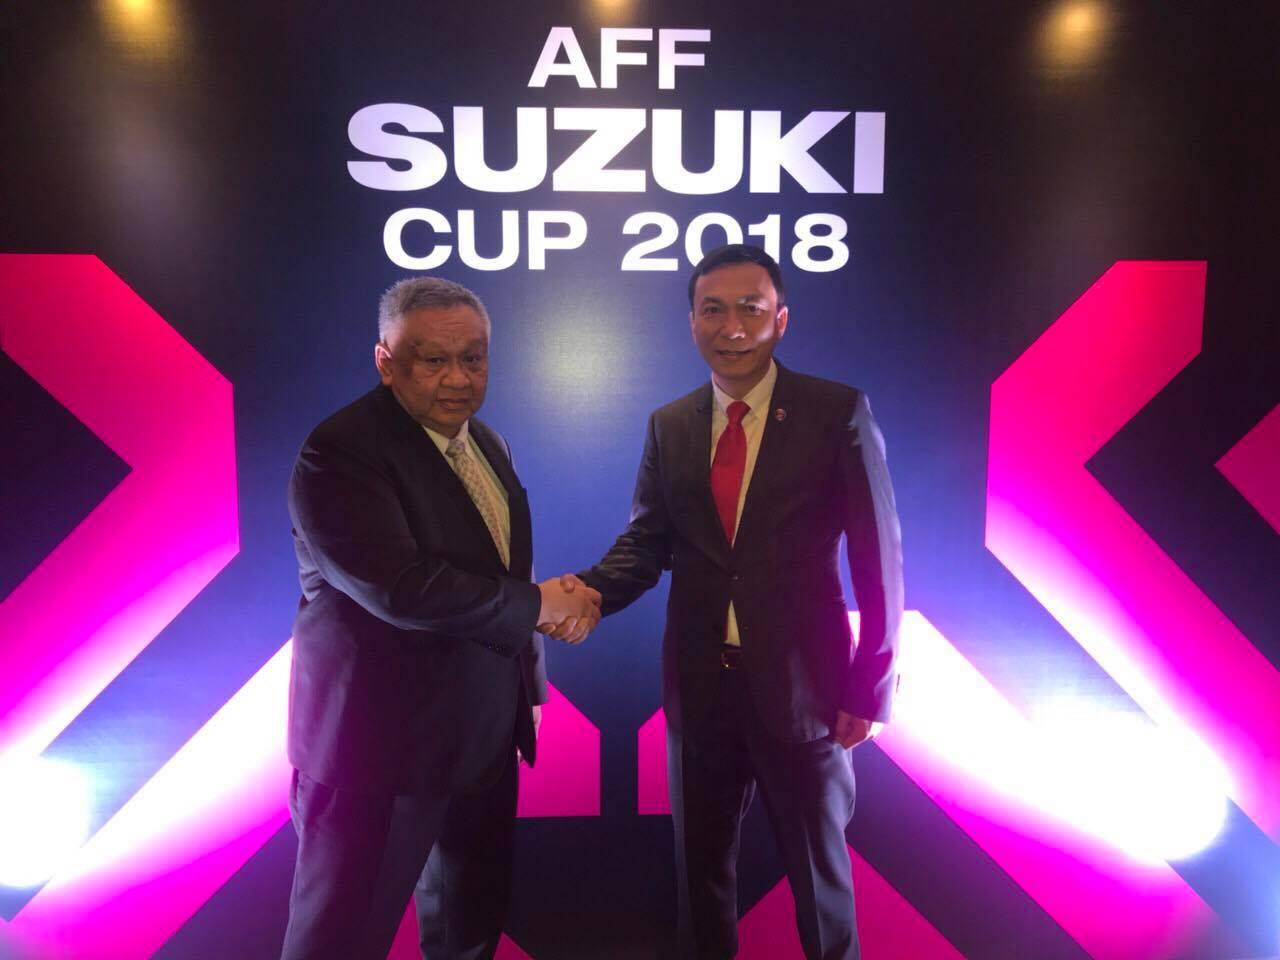 Vietnam hold high hopes for final berth at 2018 SE Asian football championship